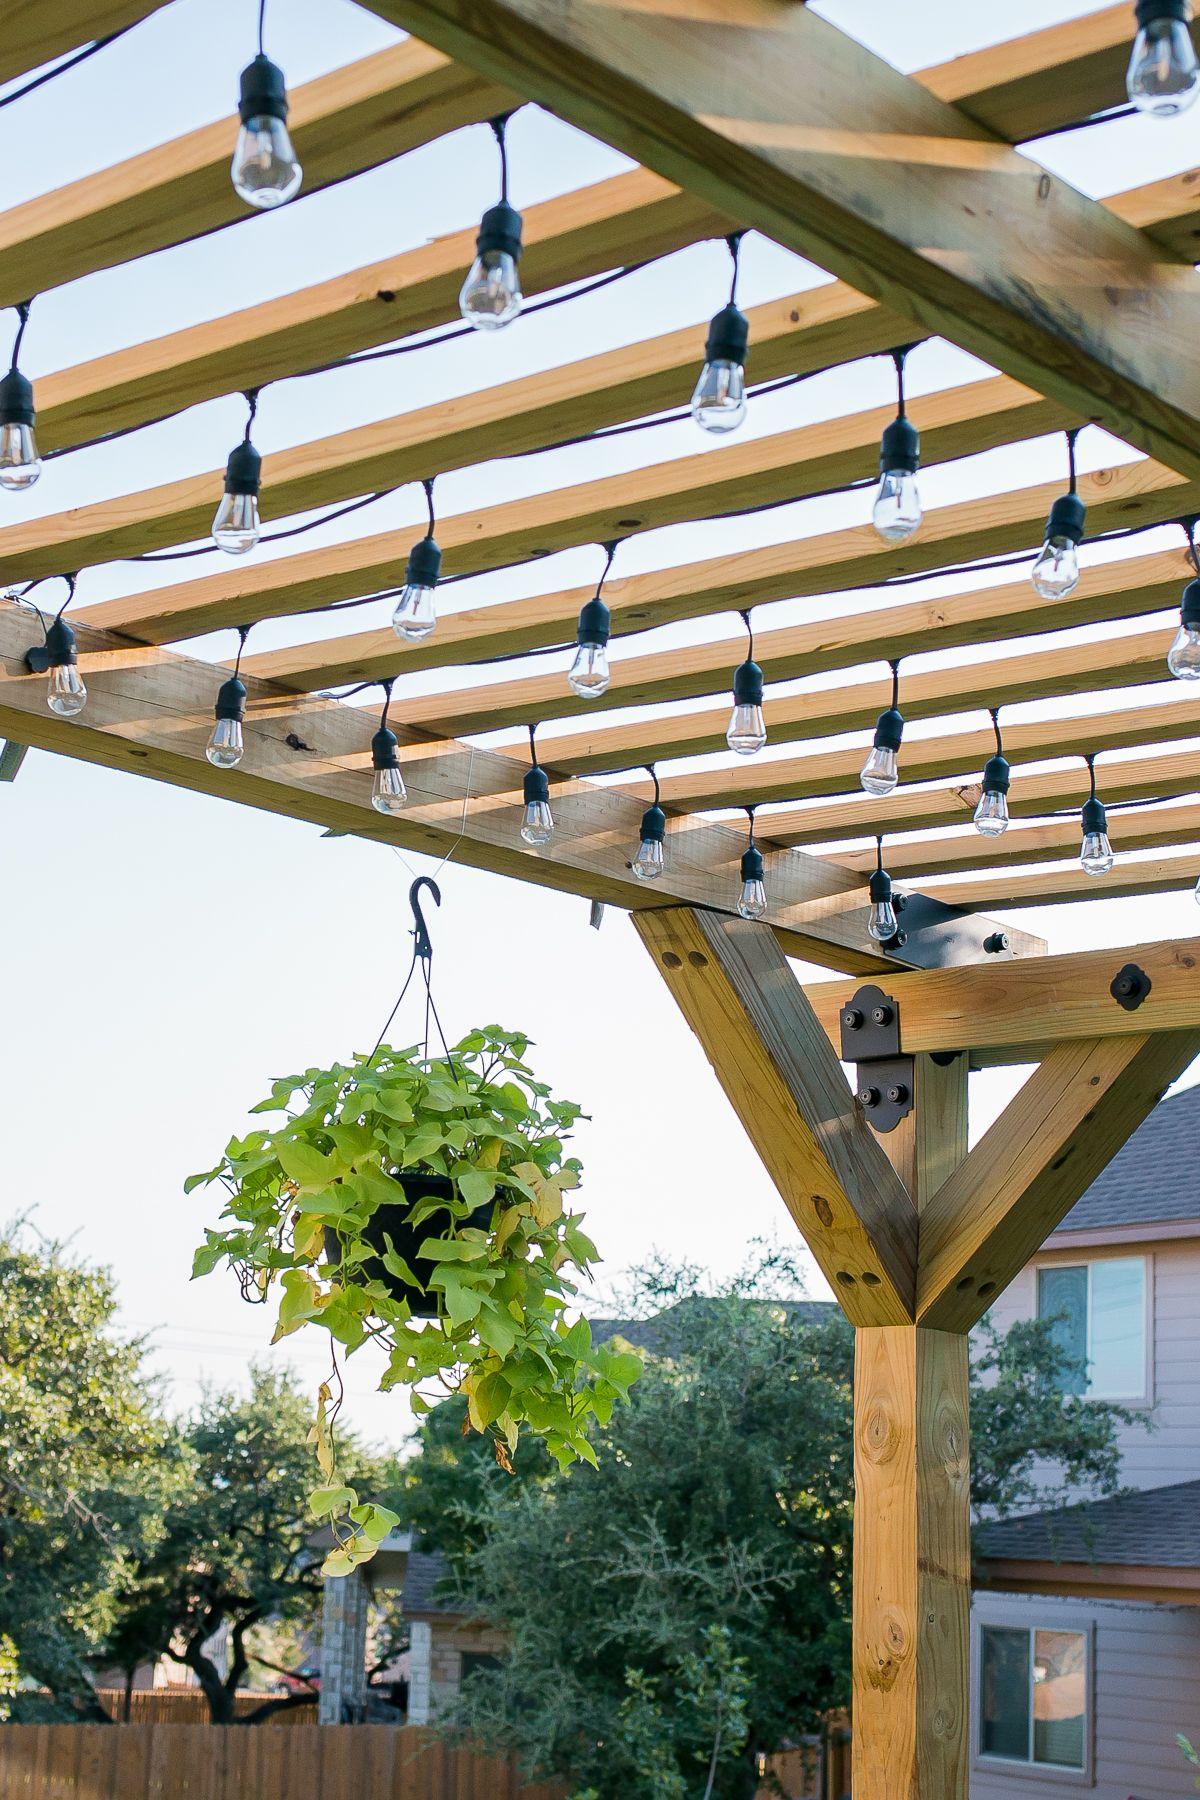 How To Build A Diy Pergola With Simpson Strong Tie Outdoor Accents Diy Pergola Pergola Patio Outdoor Pergola